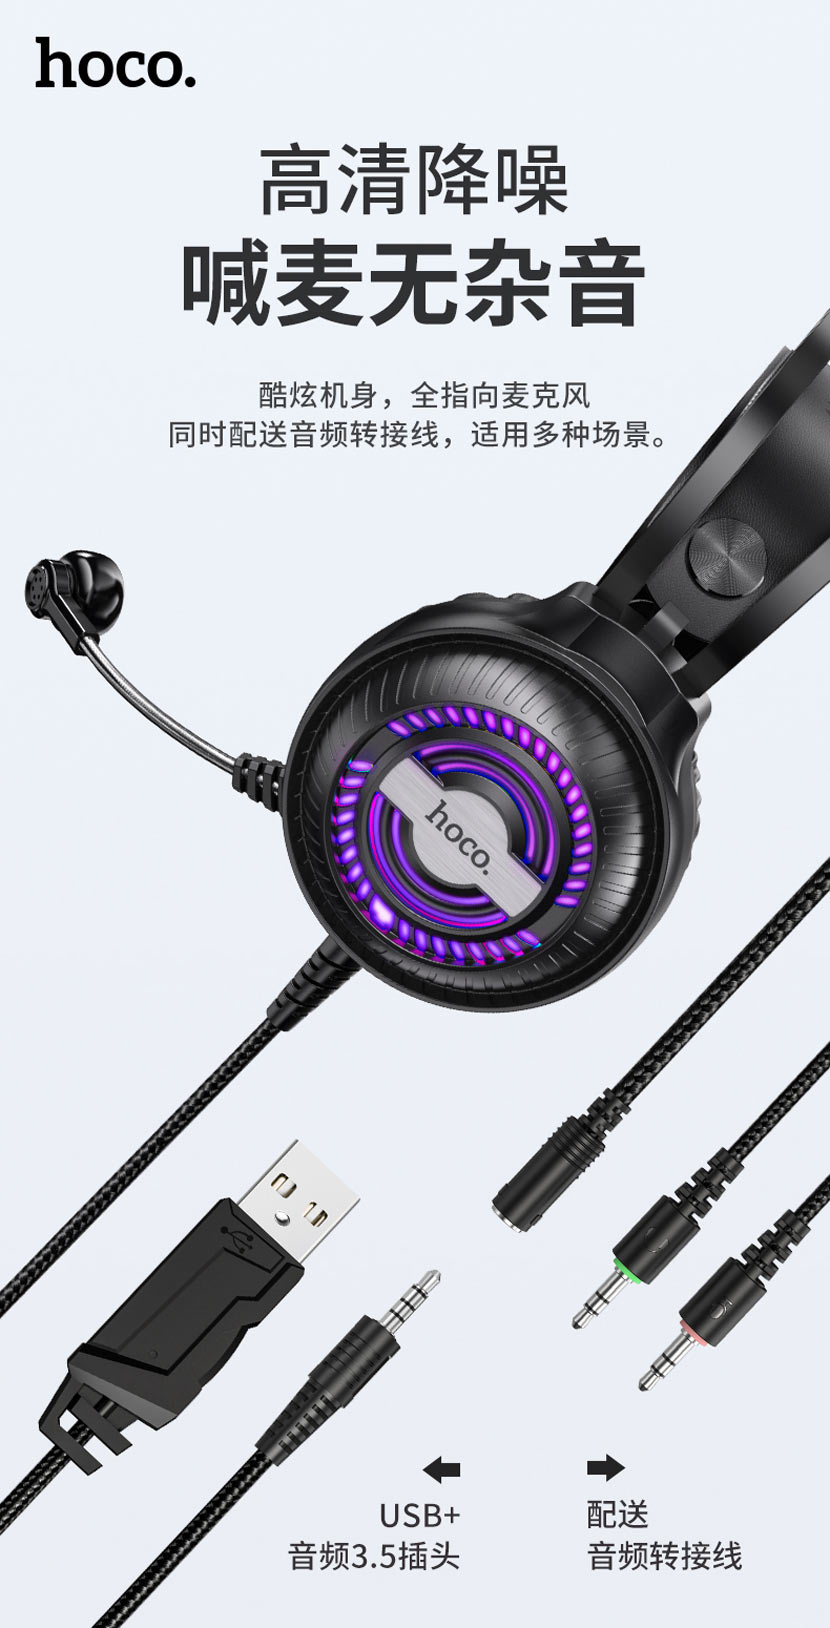 hoco news w101 streamer gaming headphones sound cn